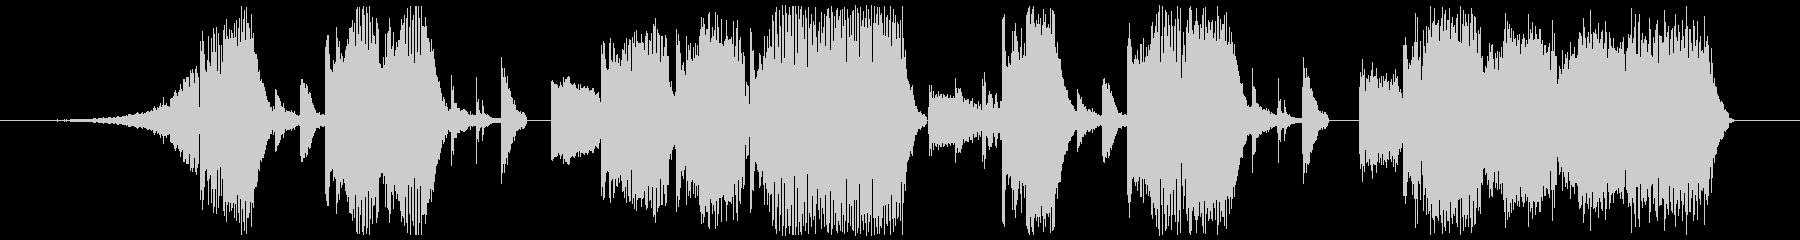 Jingle-Pop/Chip/Bassの未再生の波形